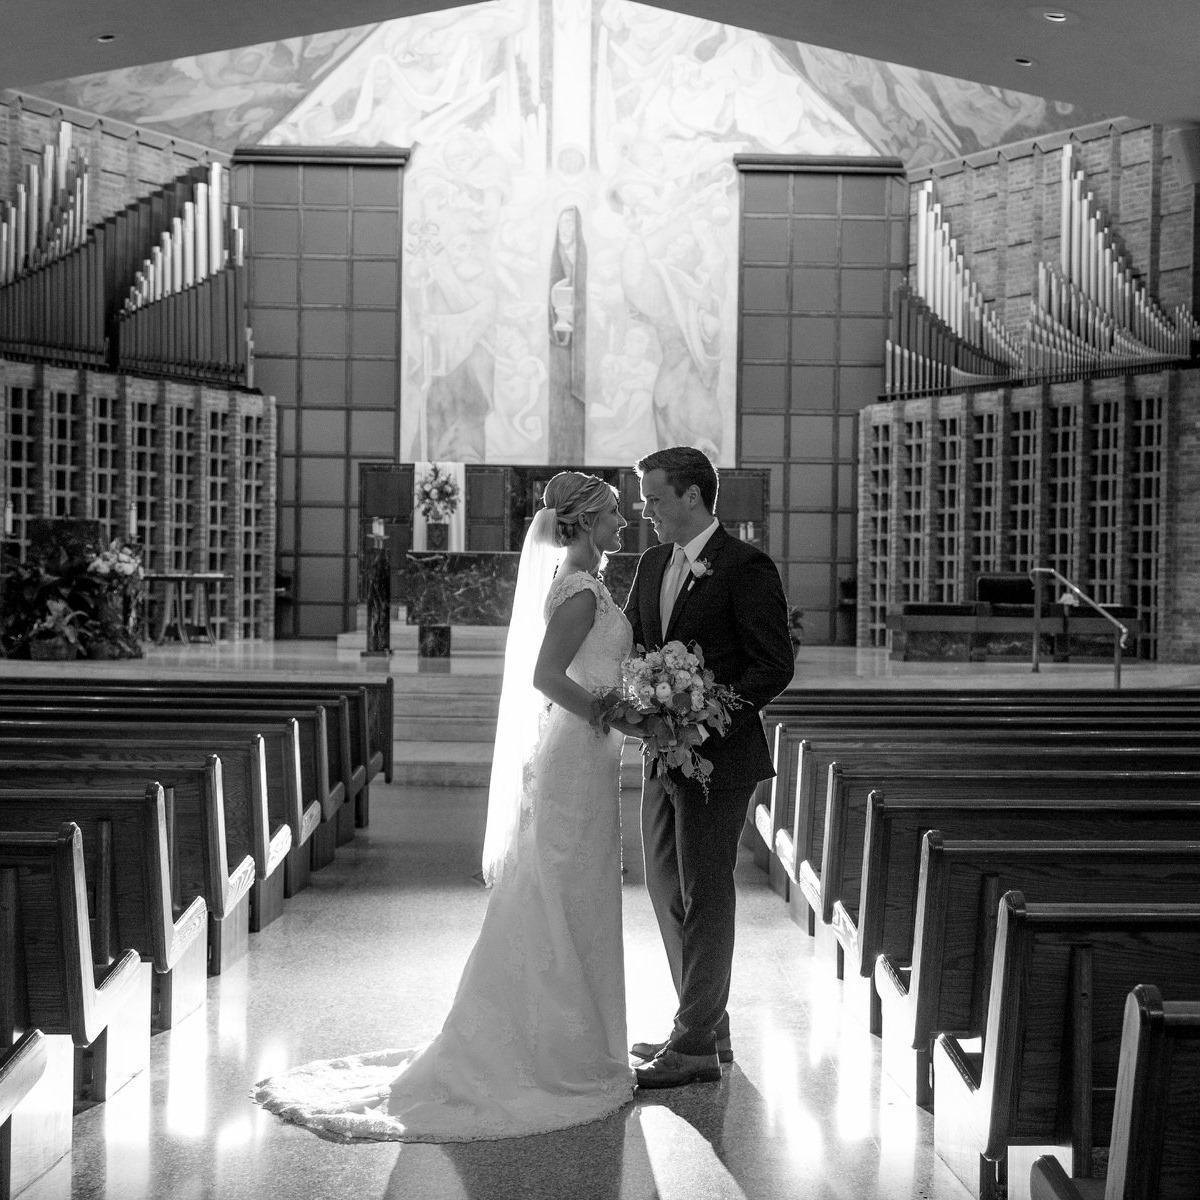 Meghan's Wedding Day